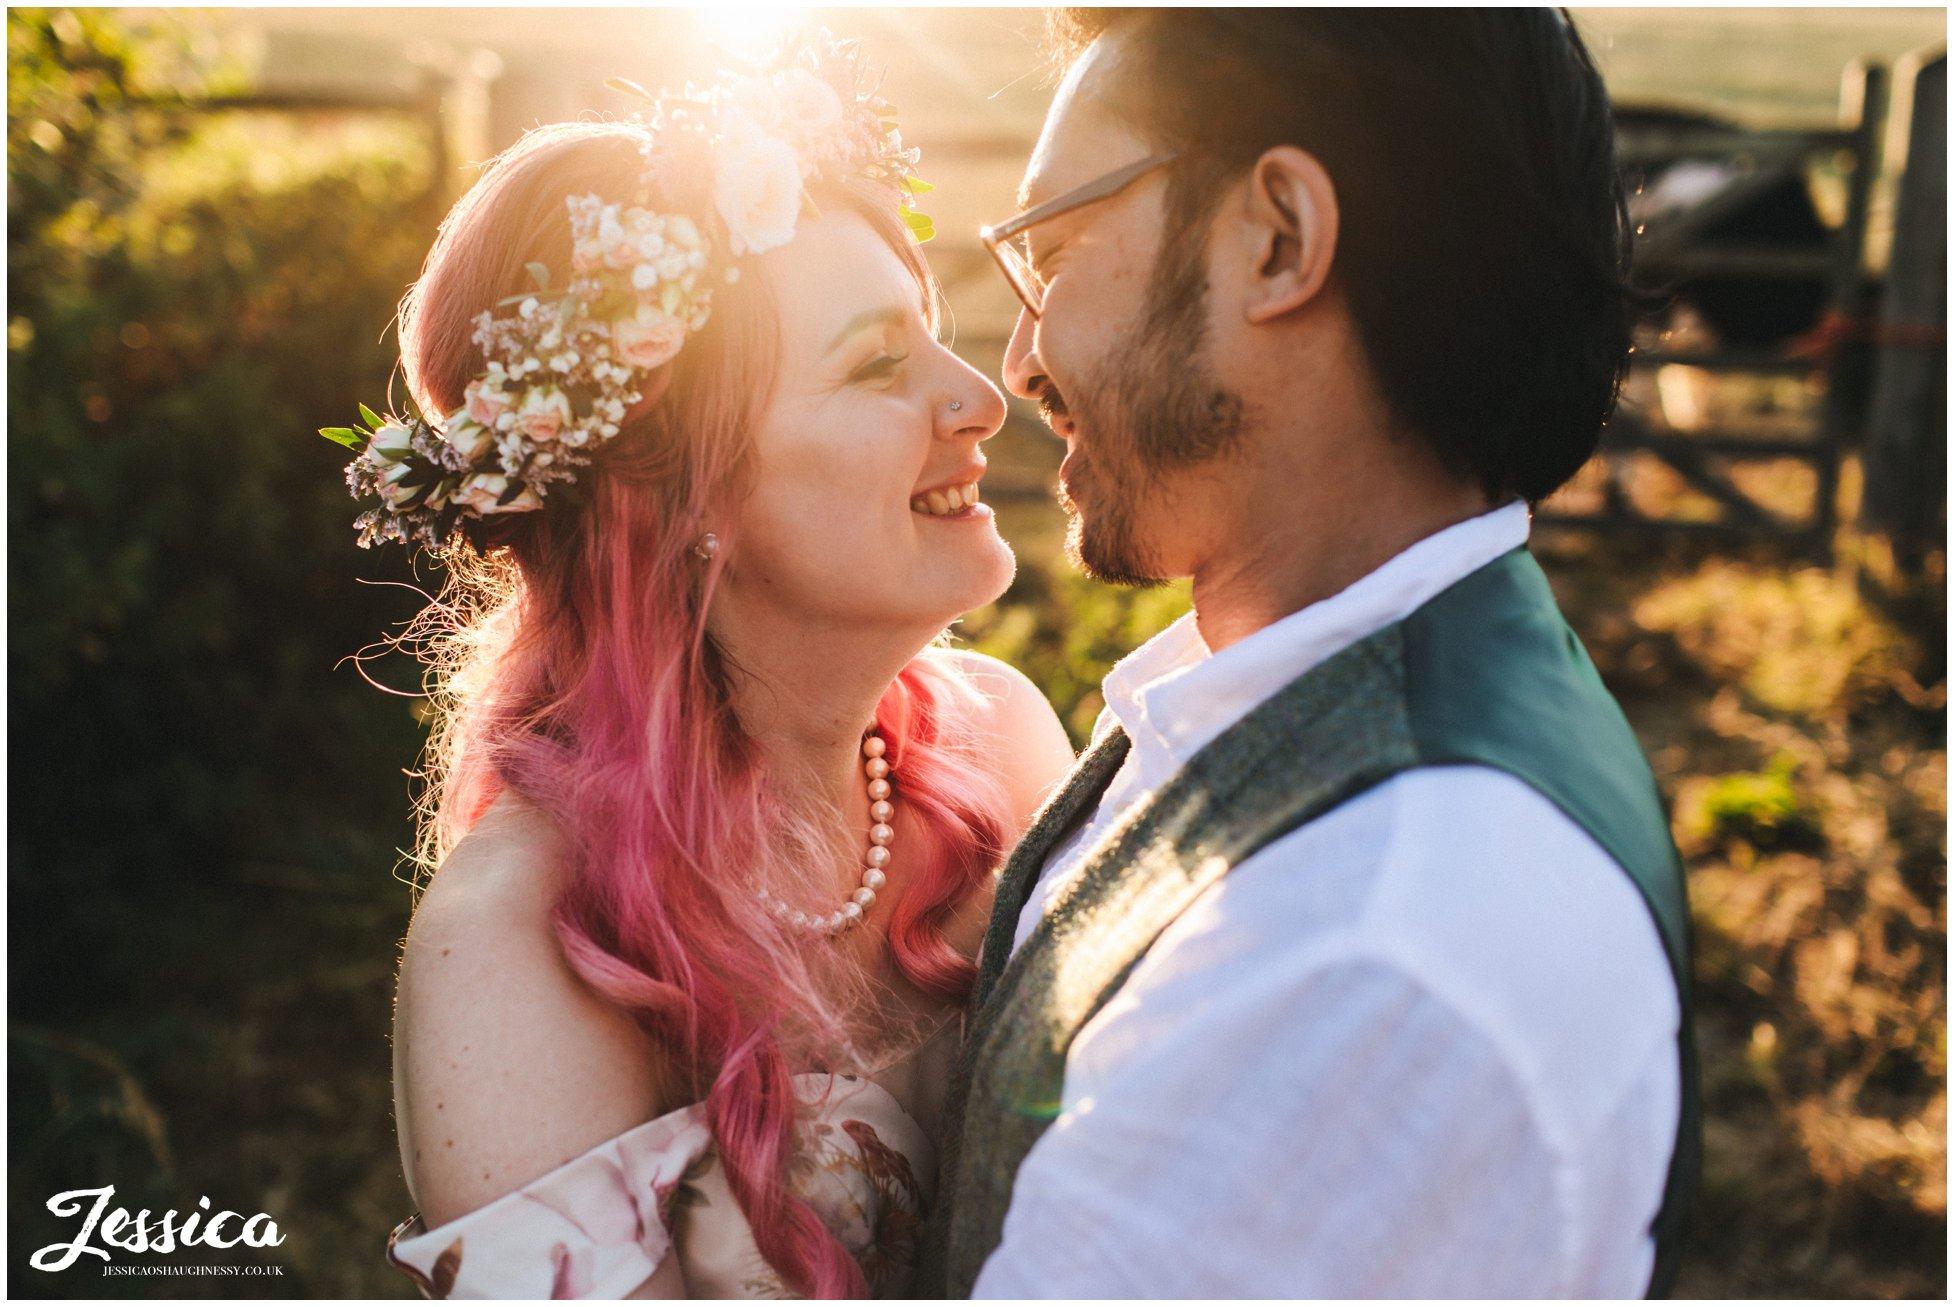 An Sugnall Walled Garden wedding in Staffordshire